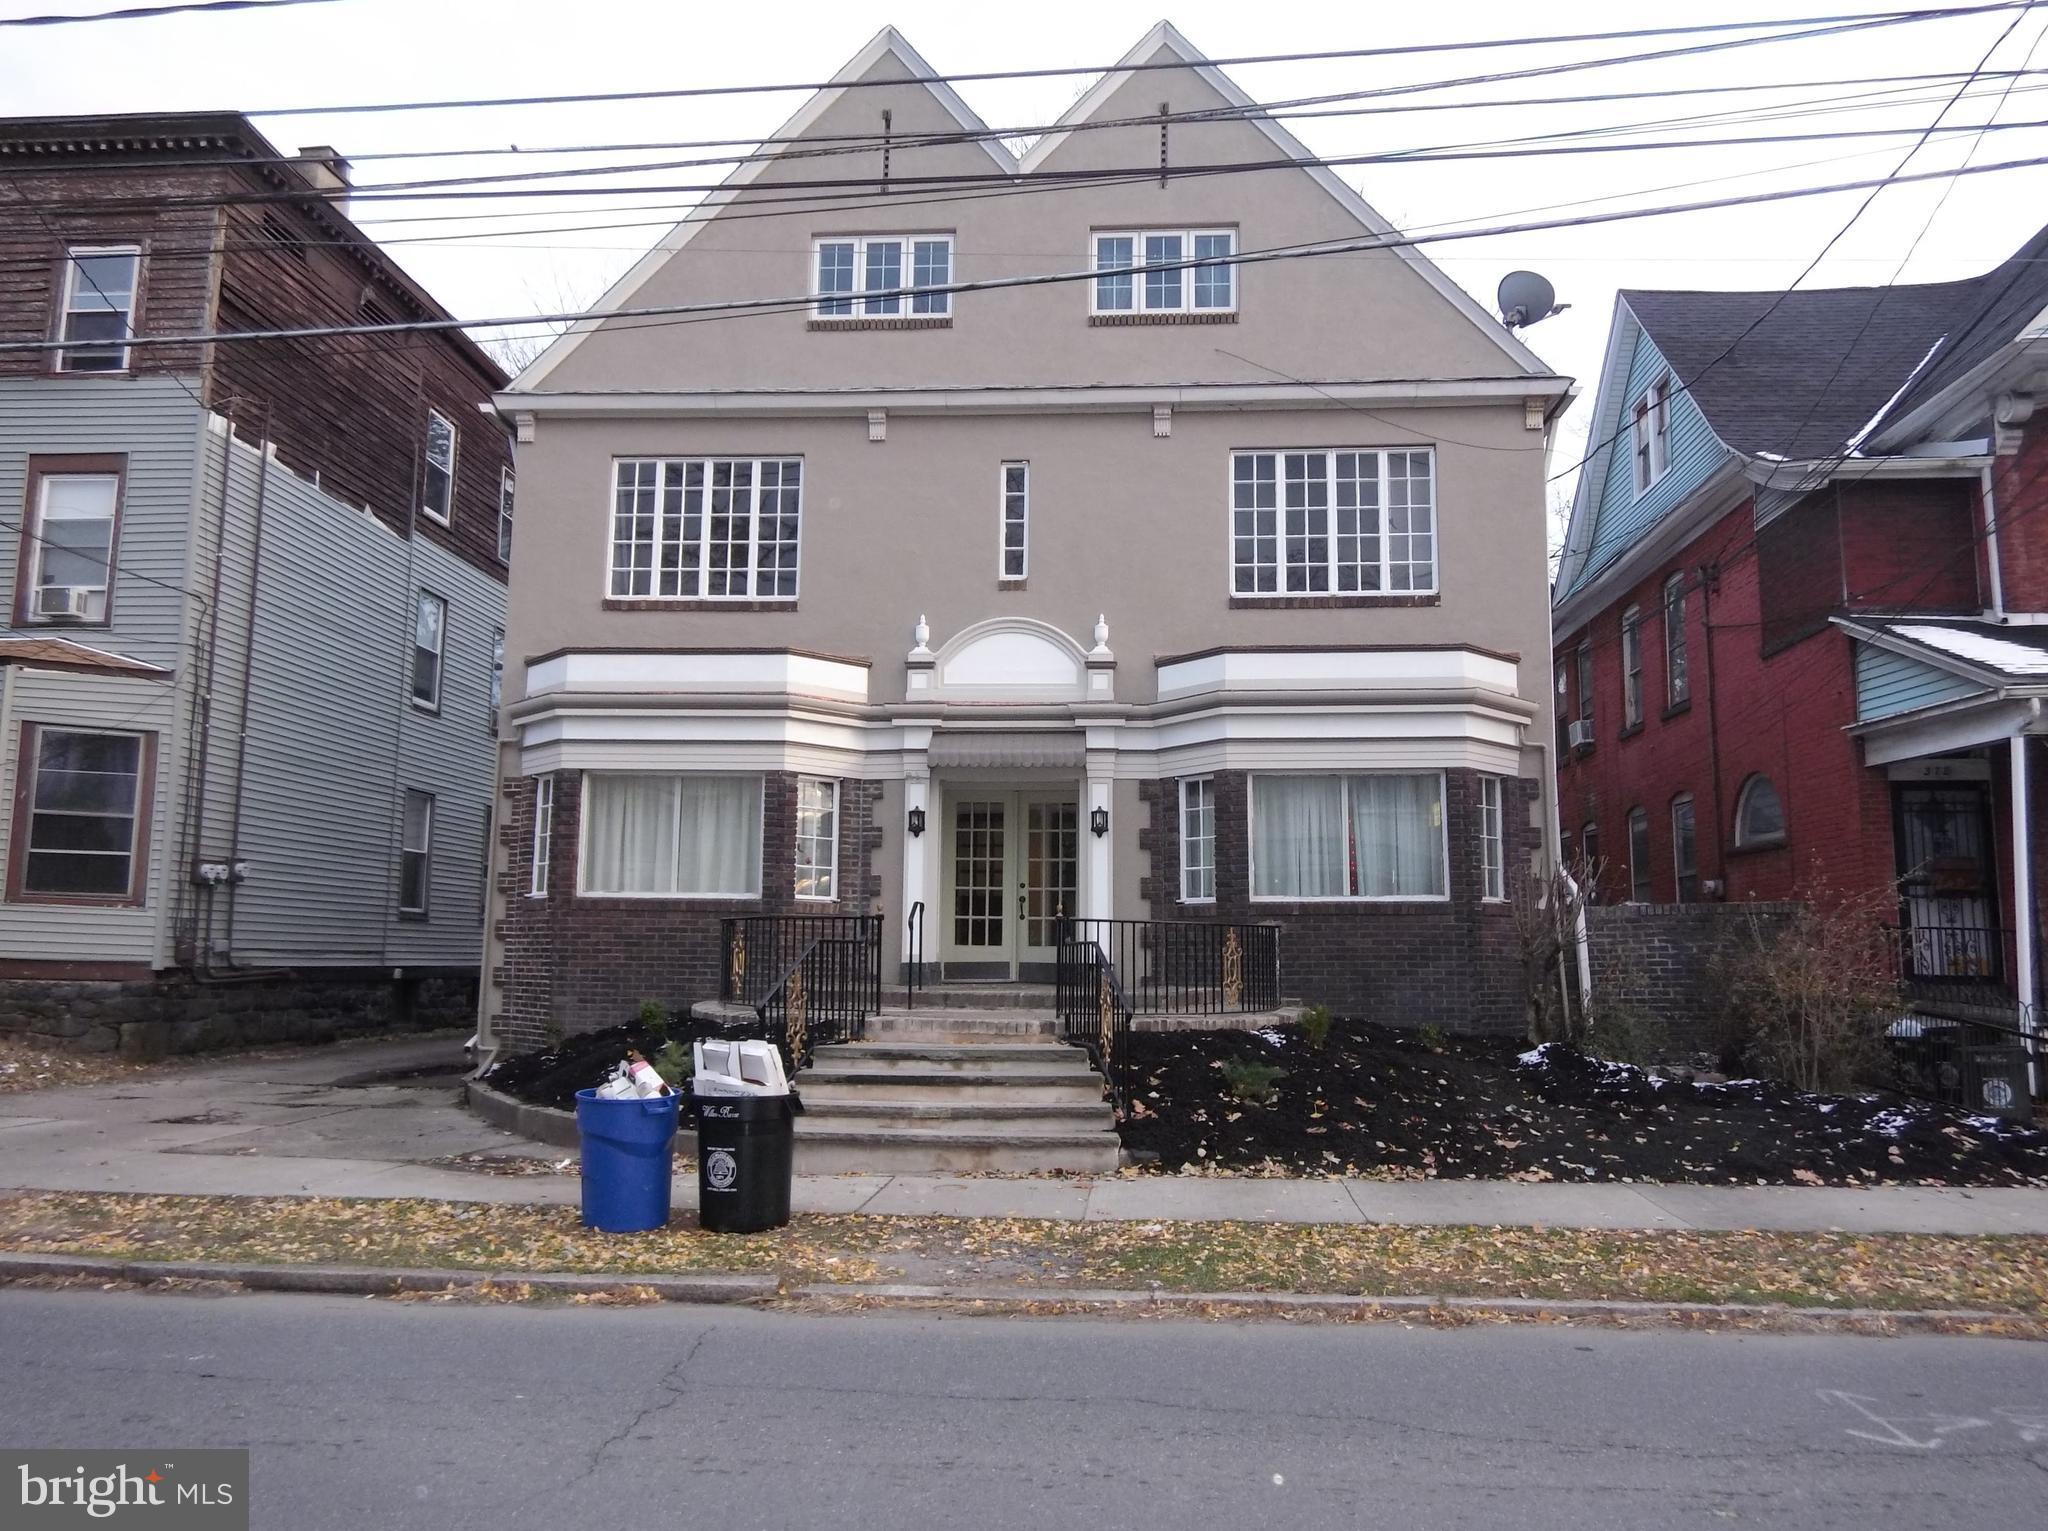 374 S RIVER STREET, WILKES BARRE, PA 18703